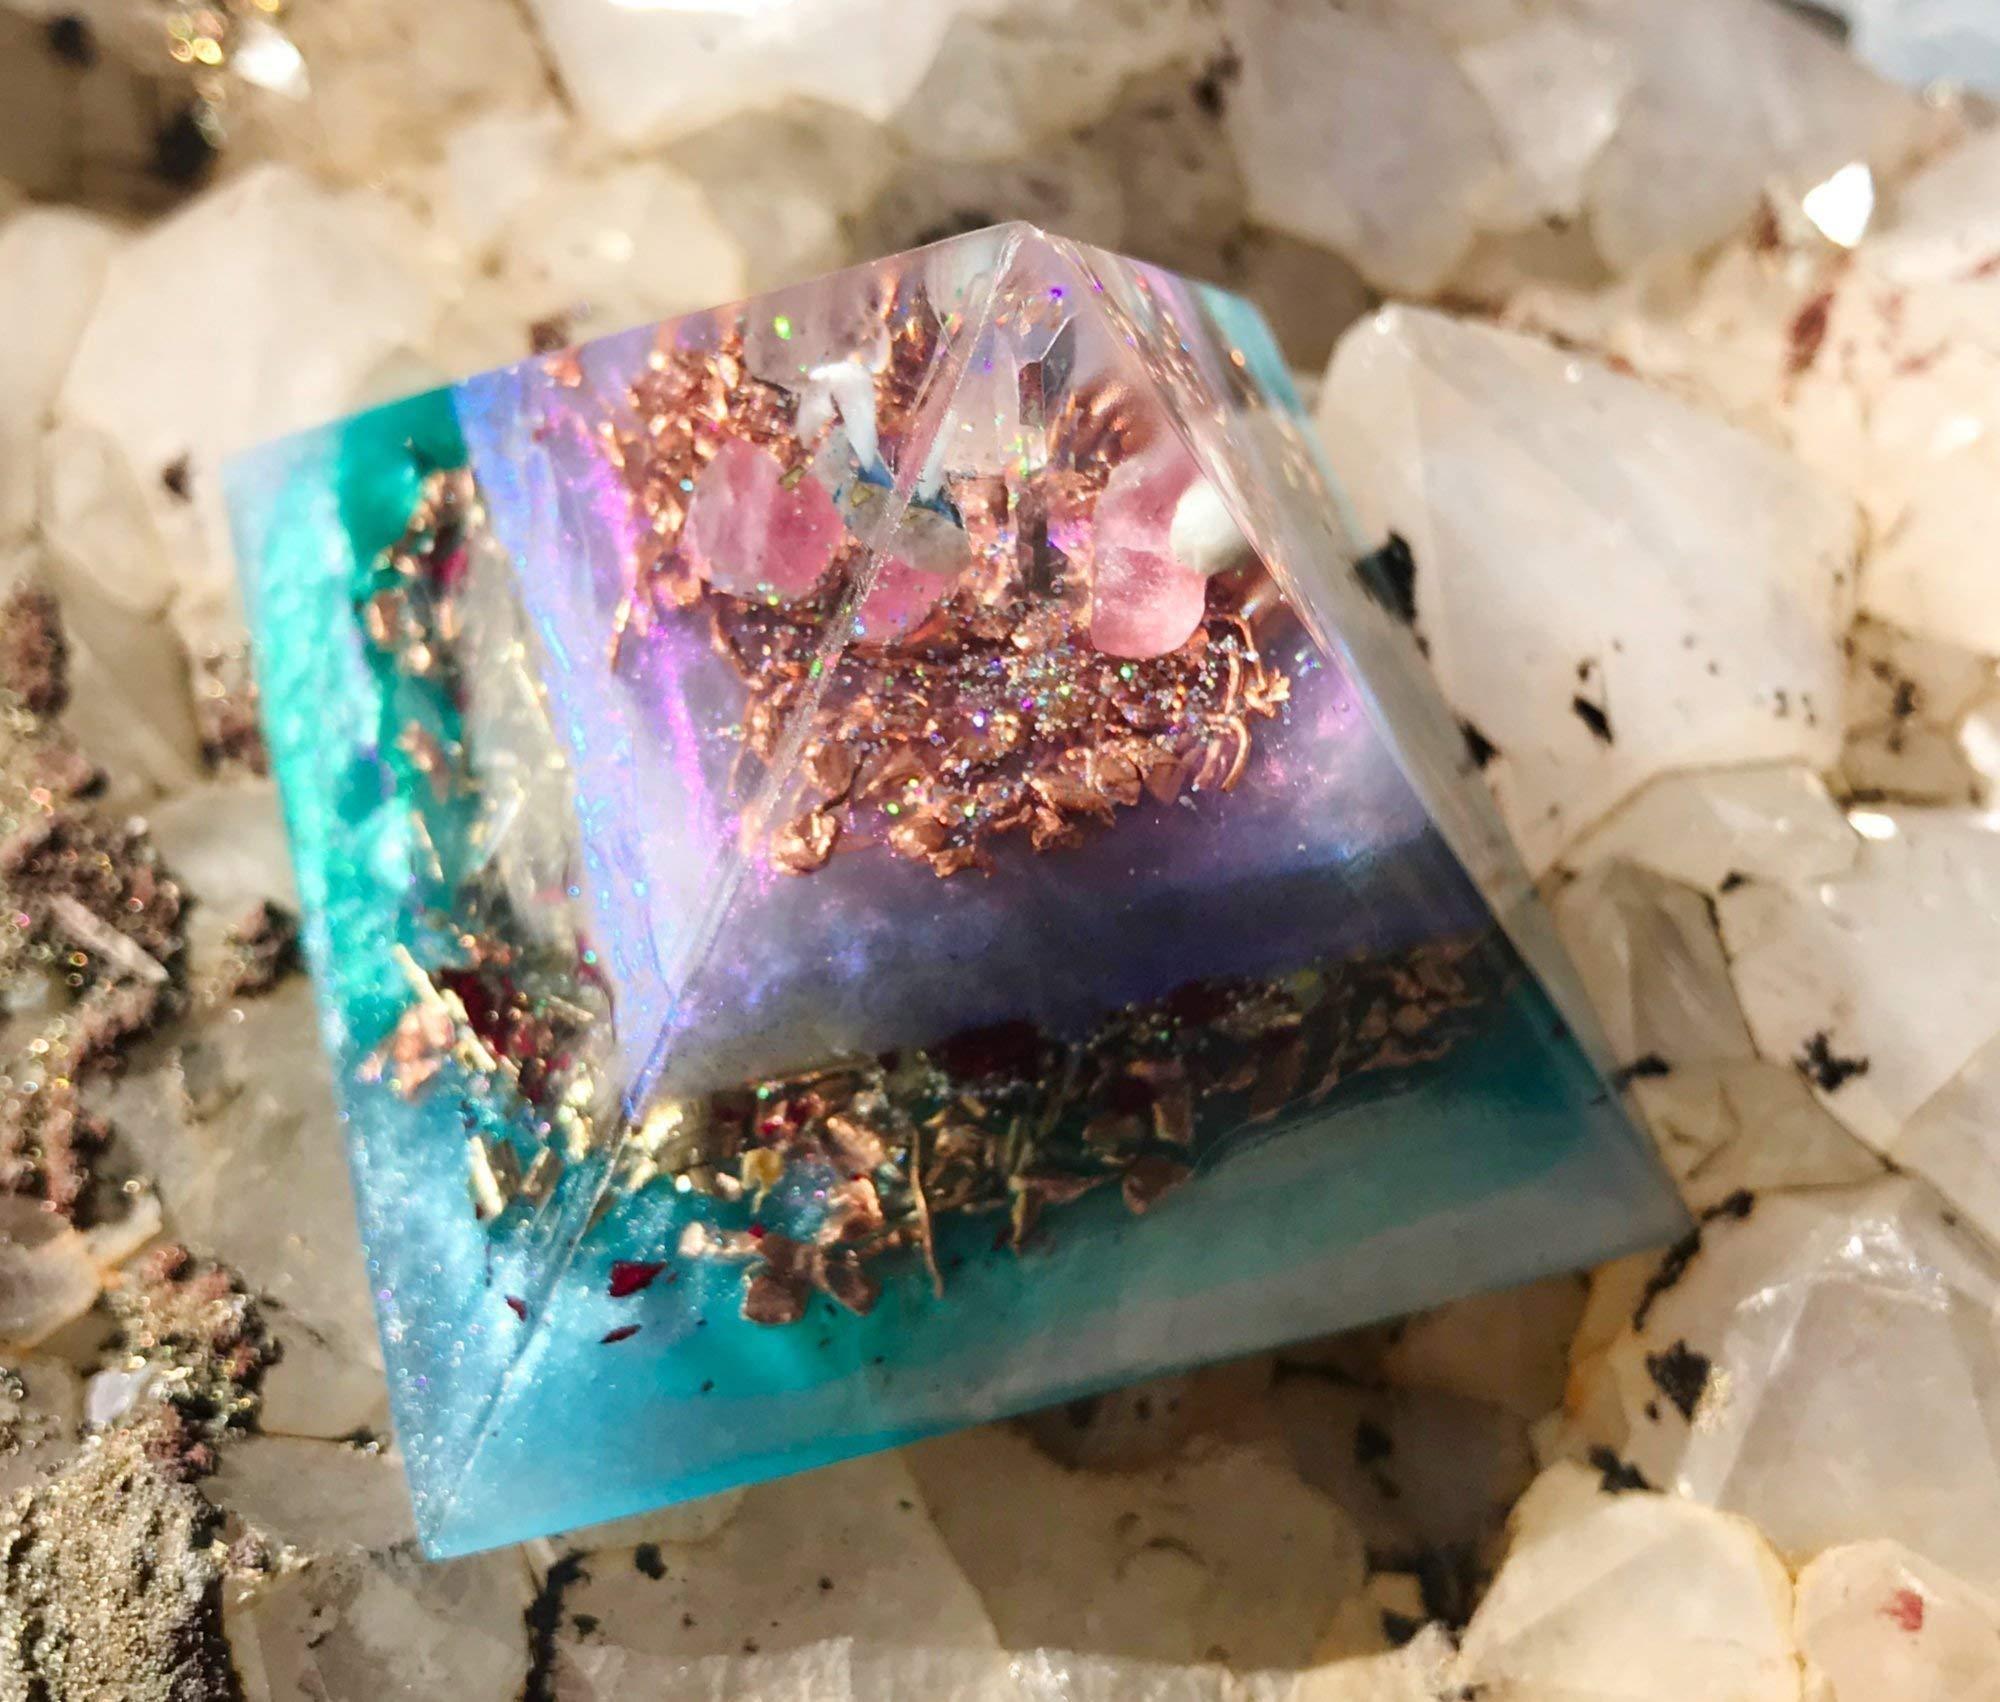 Orgone Pyramid/Goddess Healing Crystals Orgonite Pyramids/Violet Flame Orgone Pyramid EMF Protection